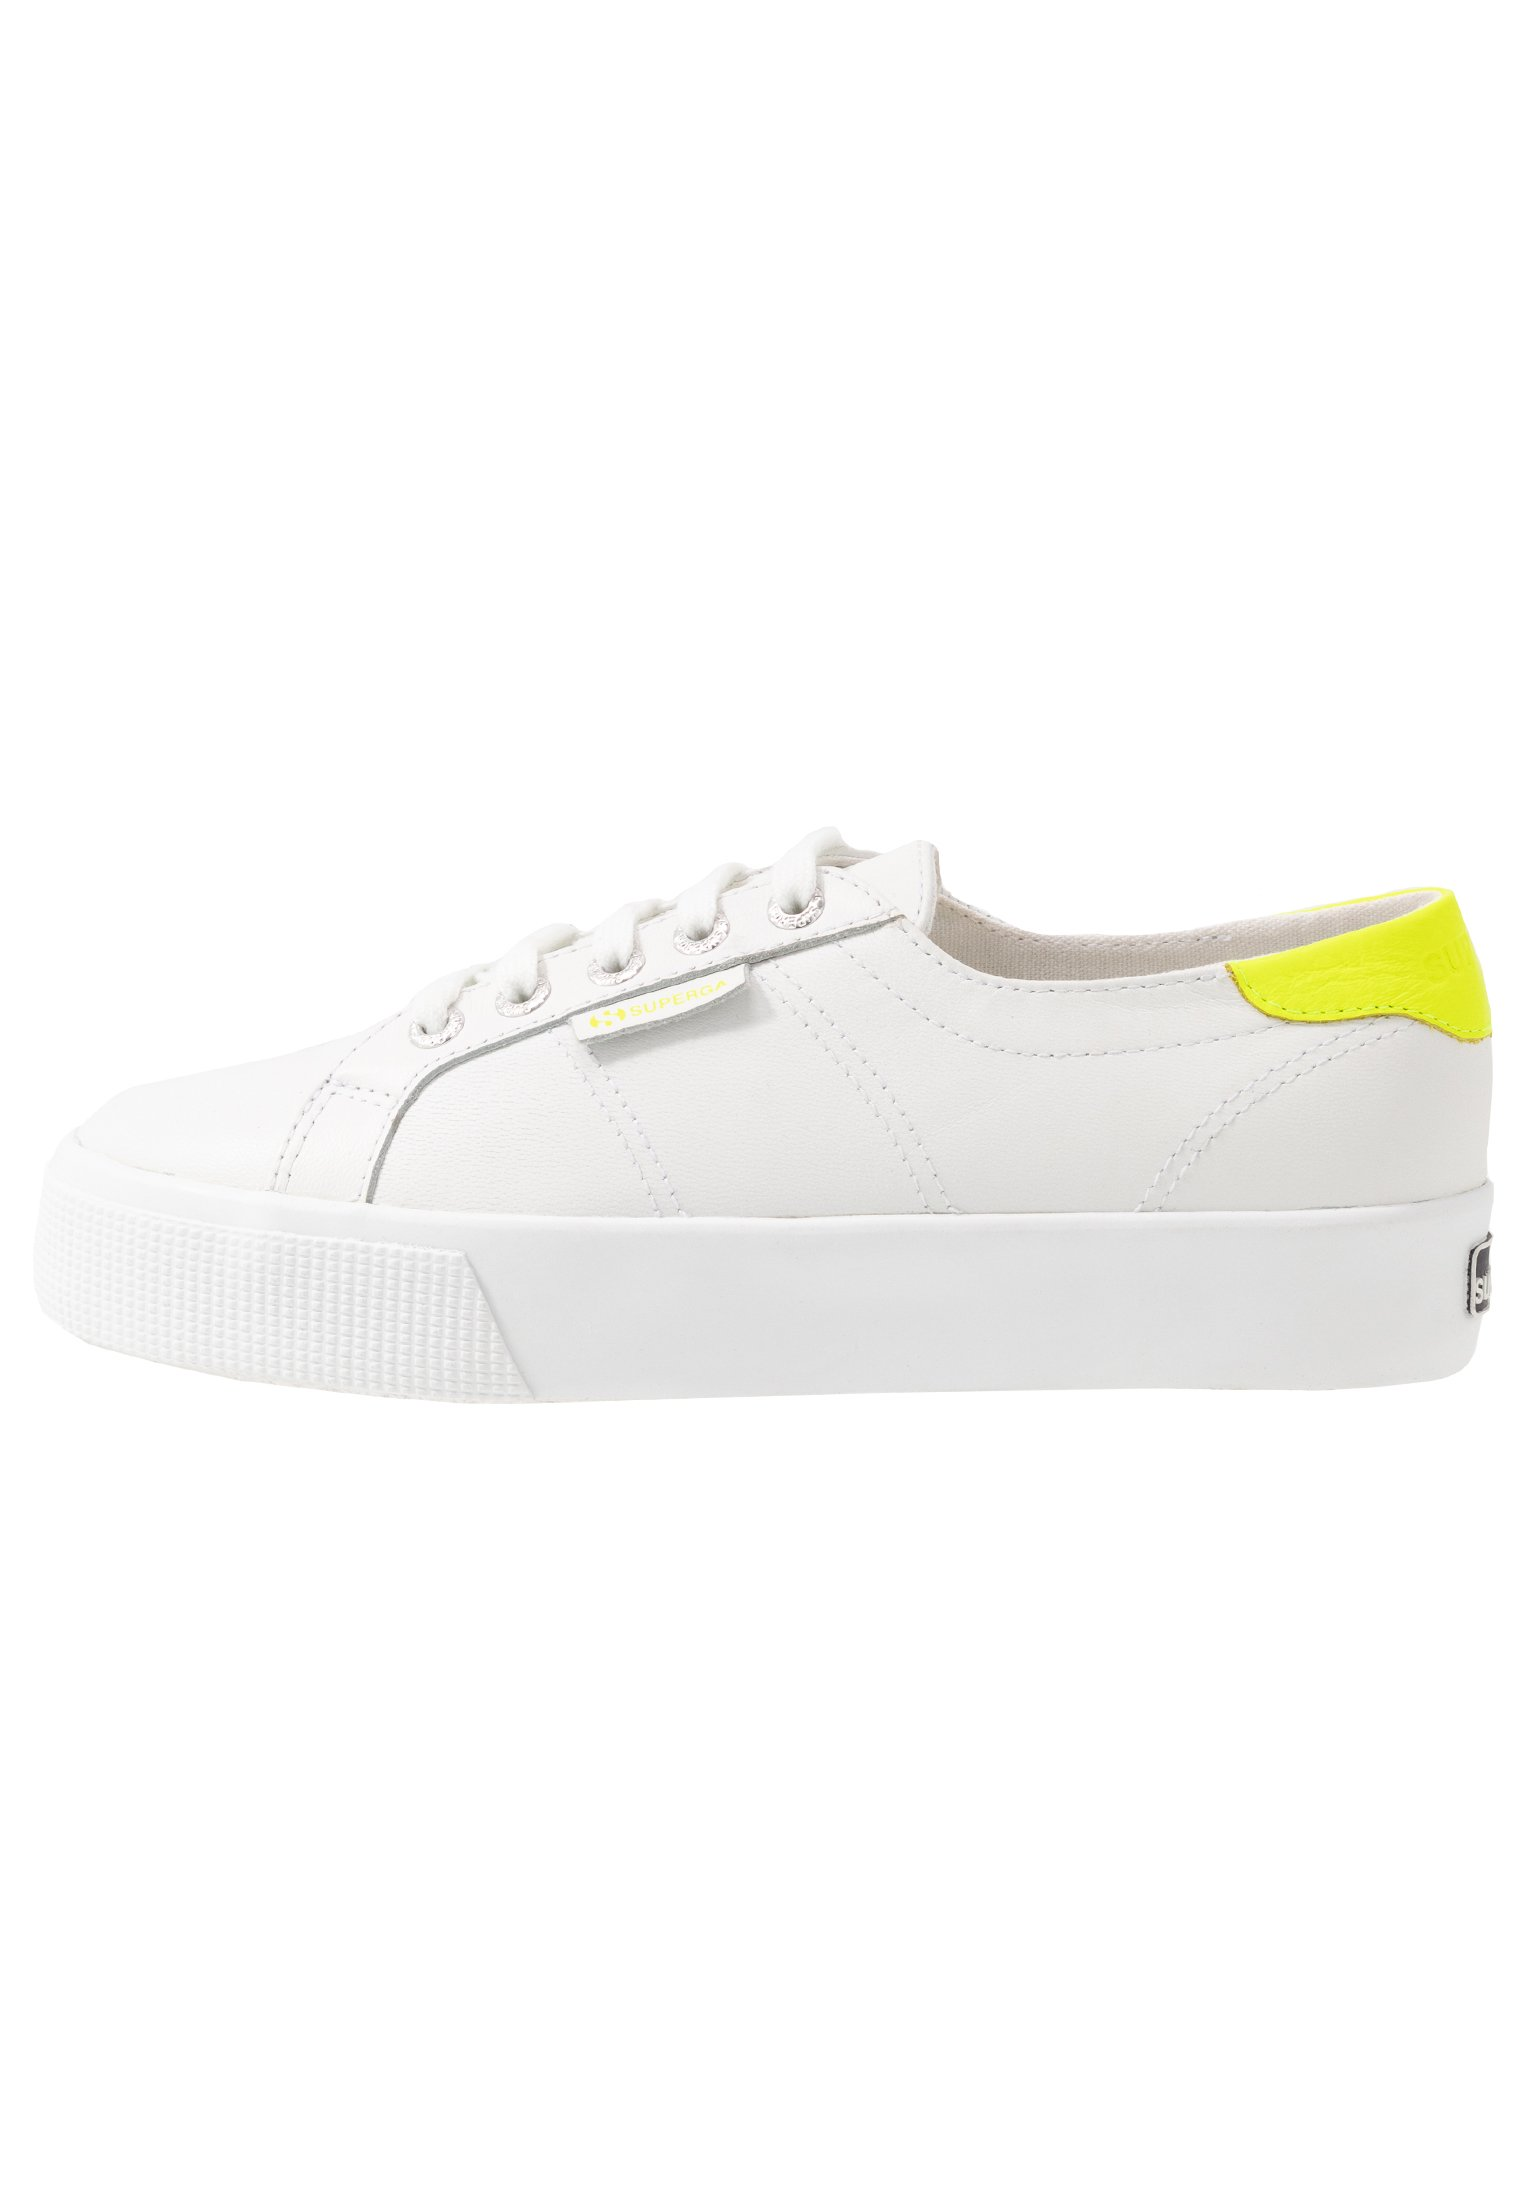 2736 Sneaker low whiteyellow fluo